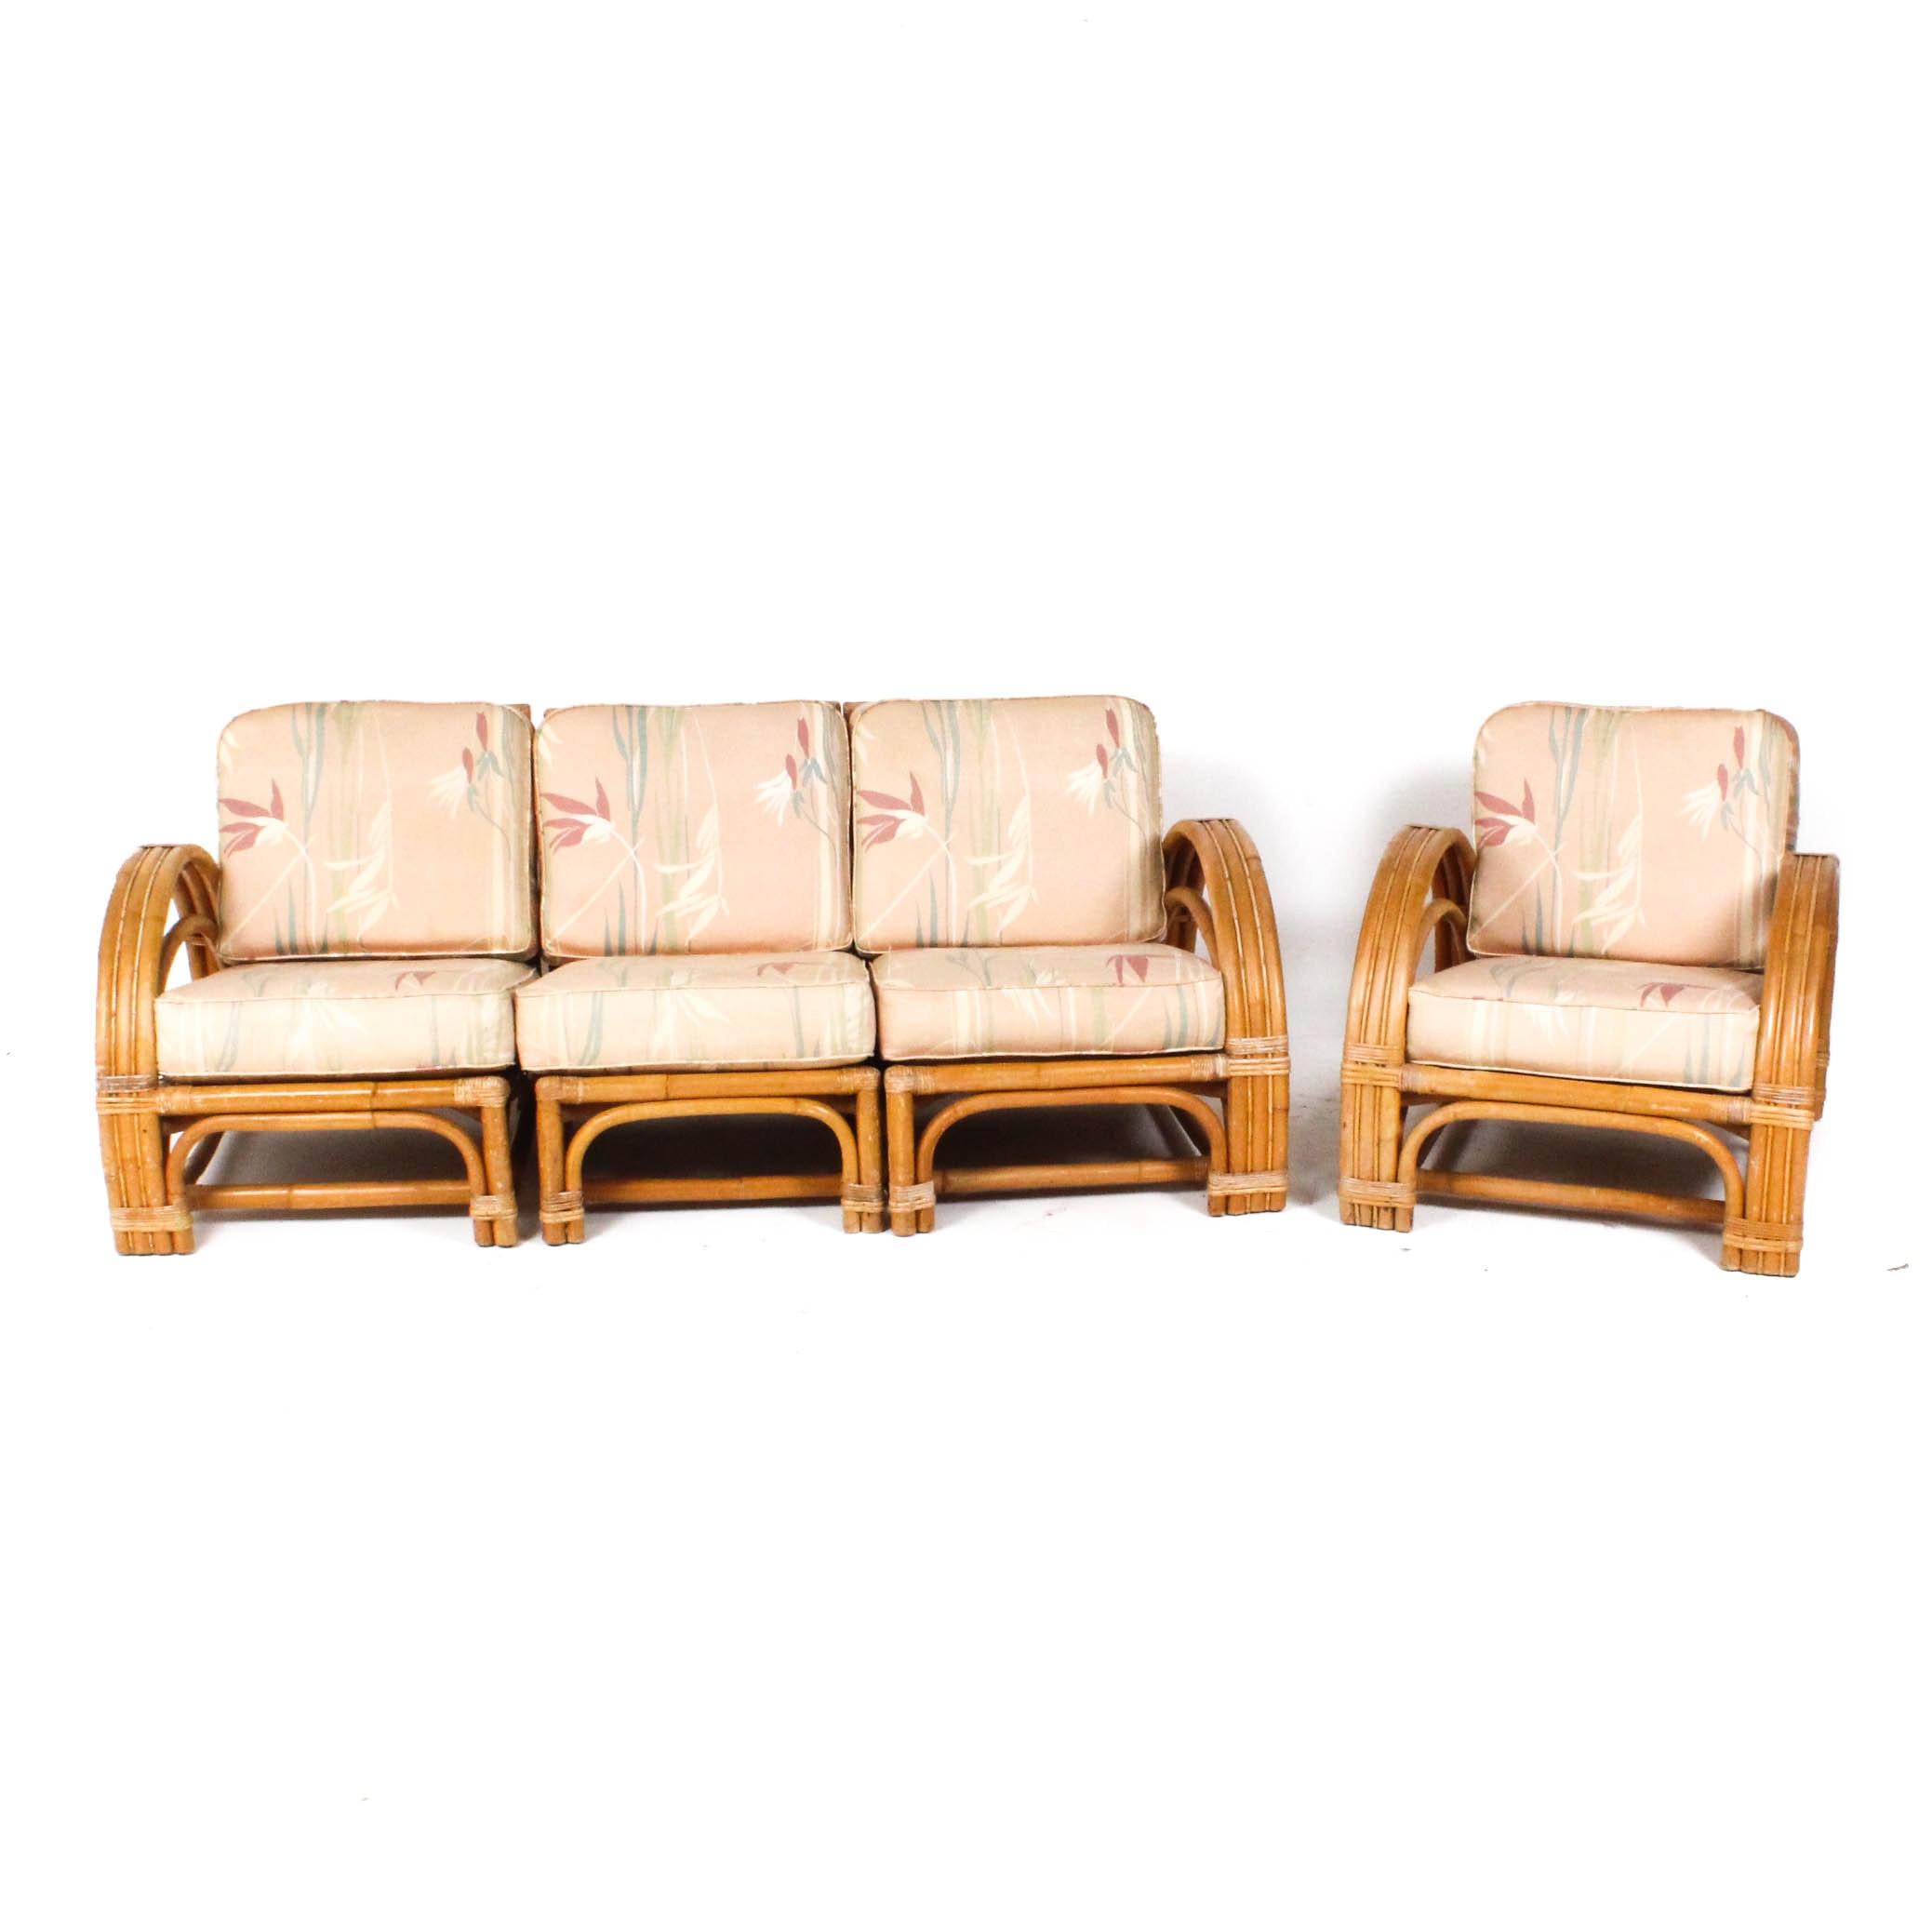 Vintage Calif-Asia Bamboo Modular Sofa and Chair